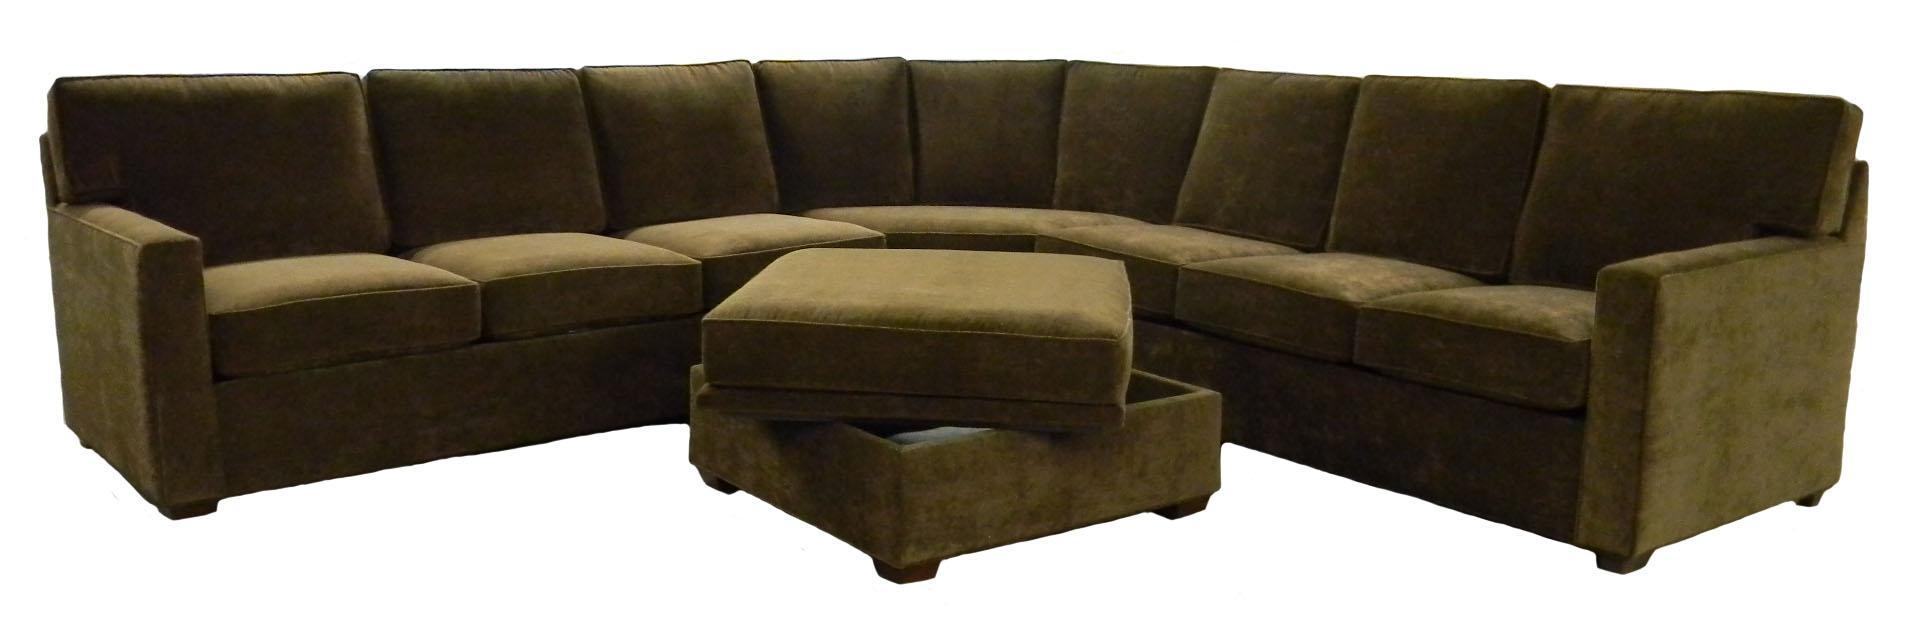 Photos Examples Custom Sectional Sofas Carolina Chair Furniture Inside Sectinal Sofas (View 9 of 20)